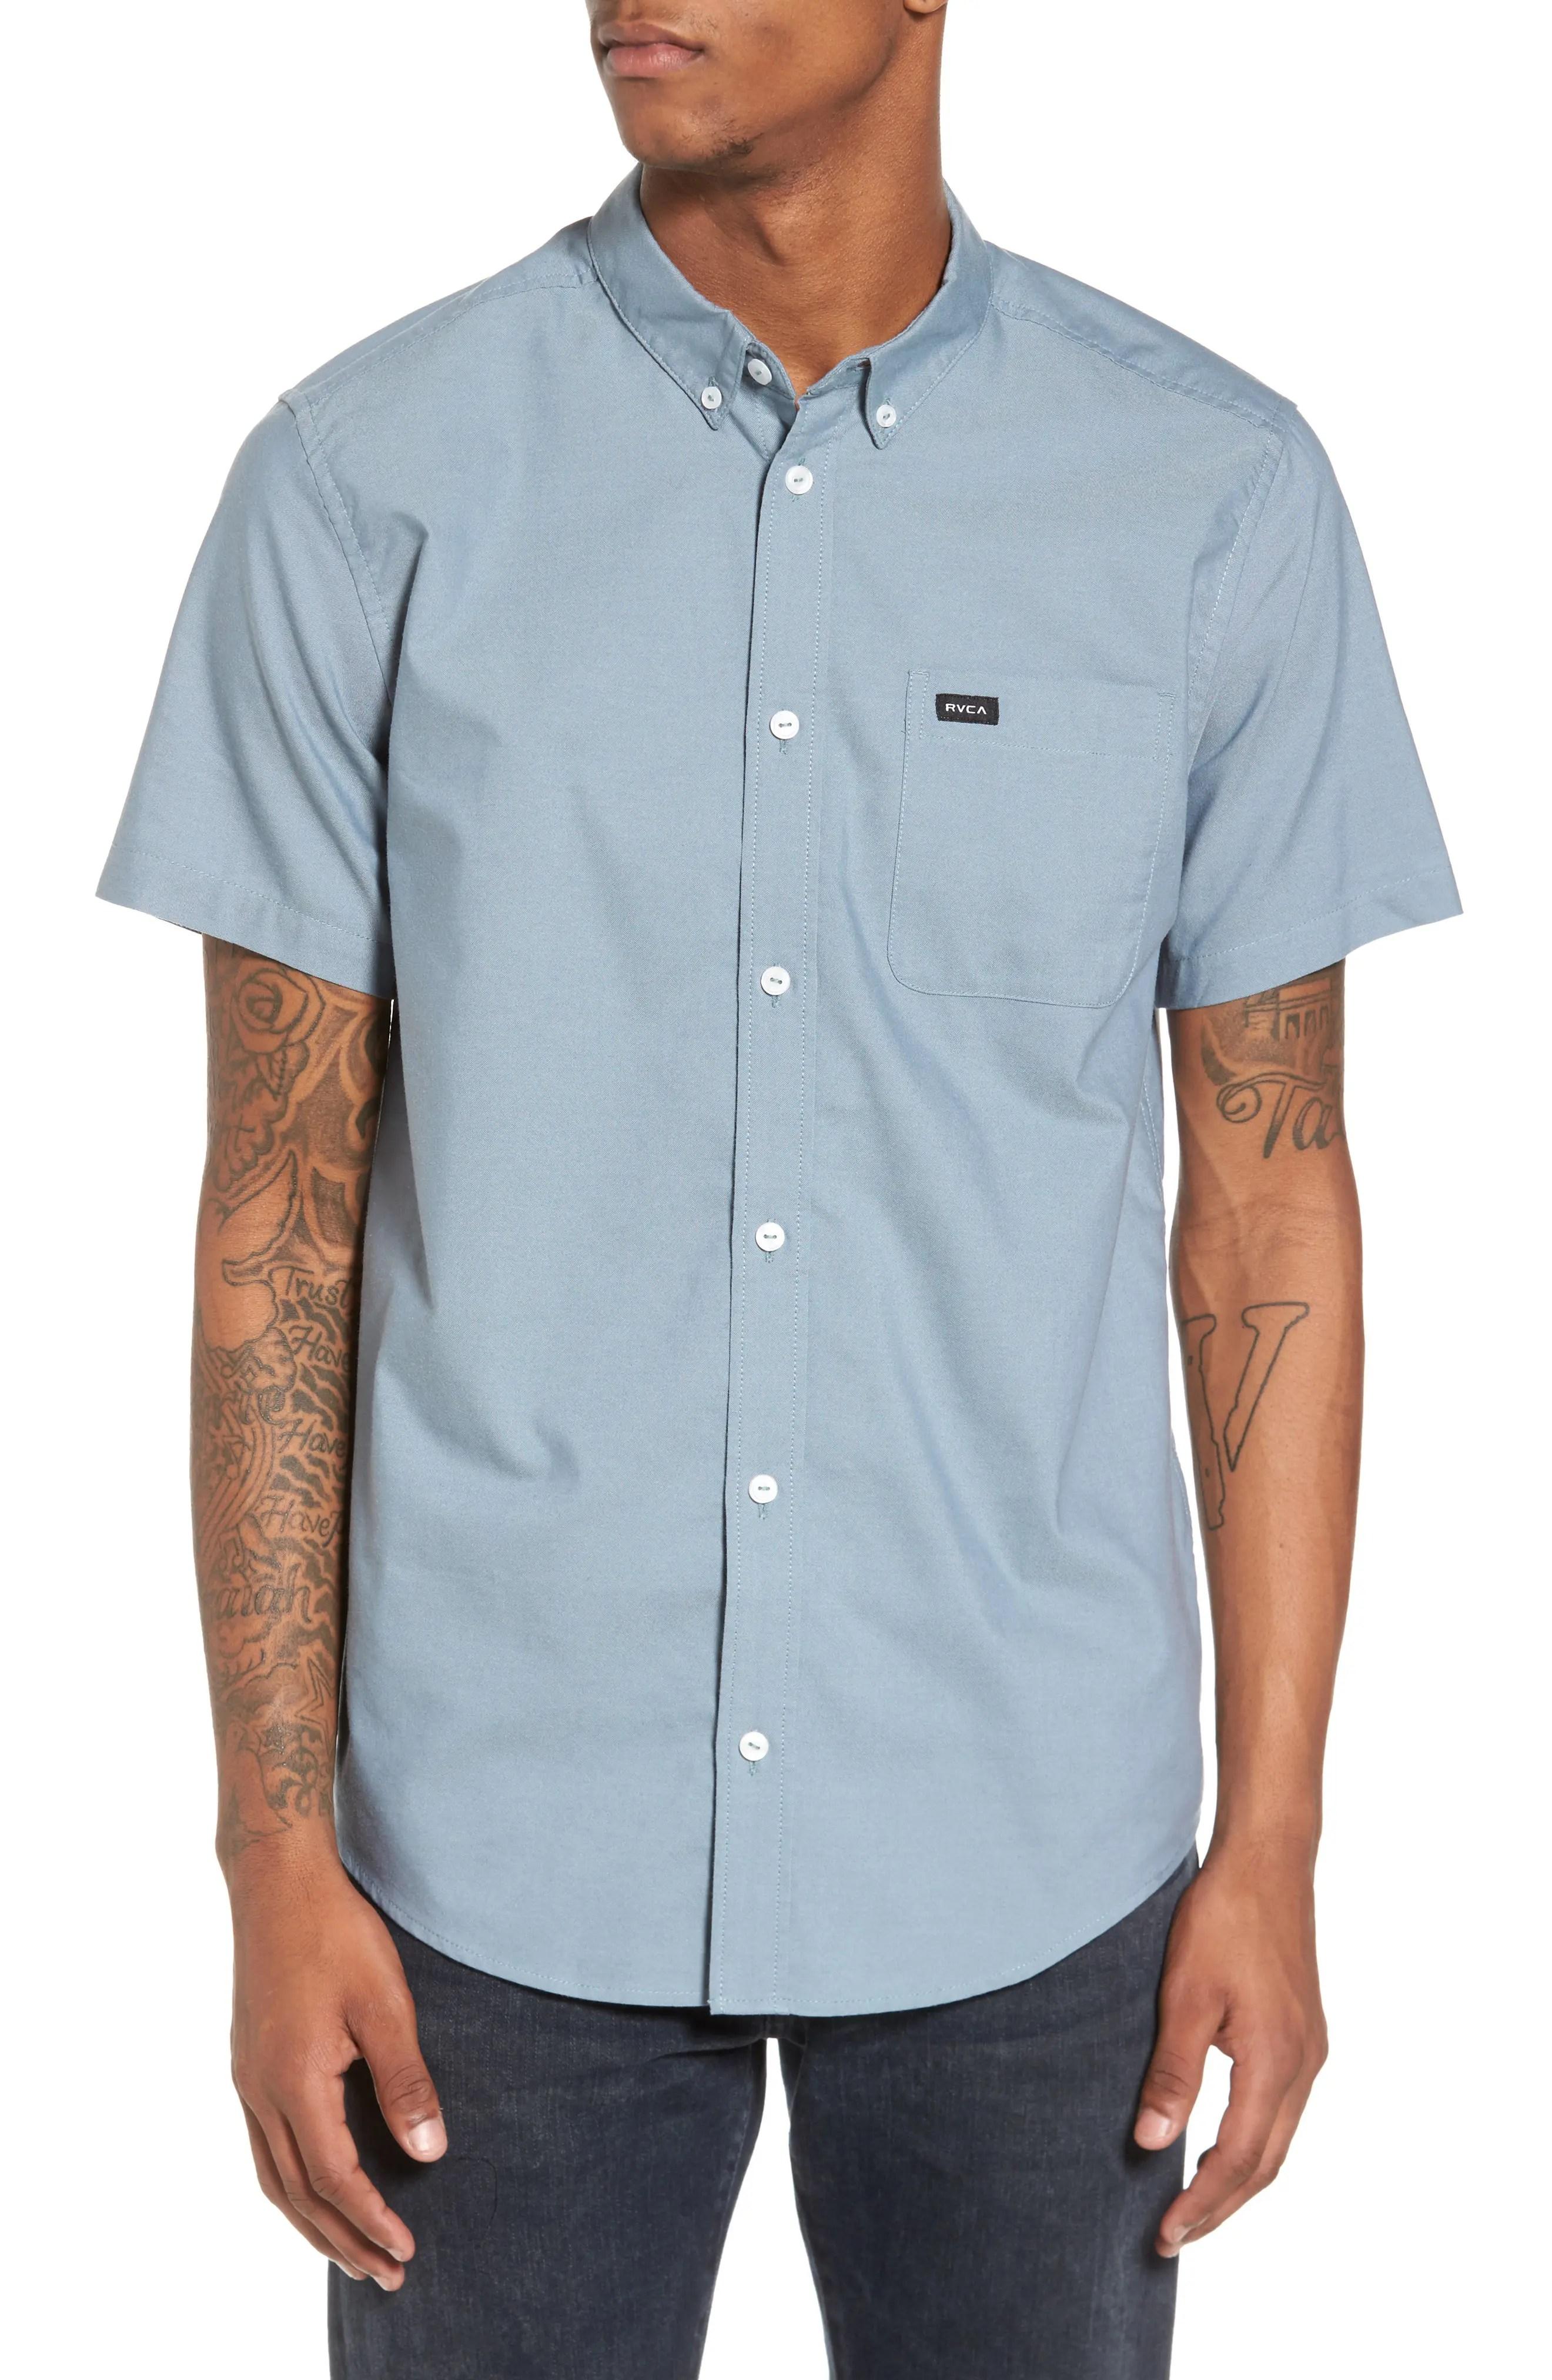 Rvca That Ll Do Slim Fit Short Sleeve Oxford Shirt